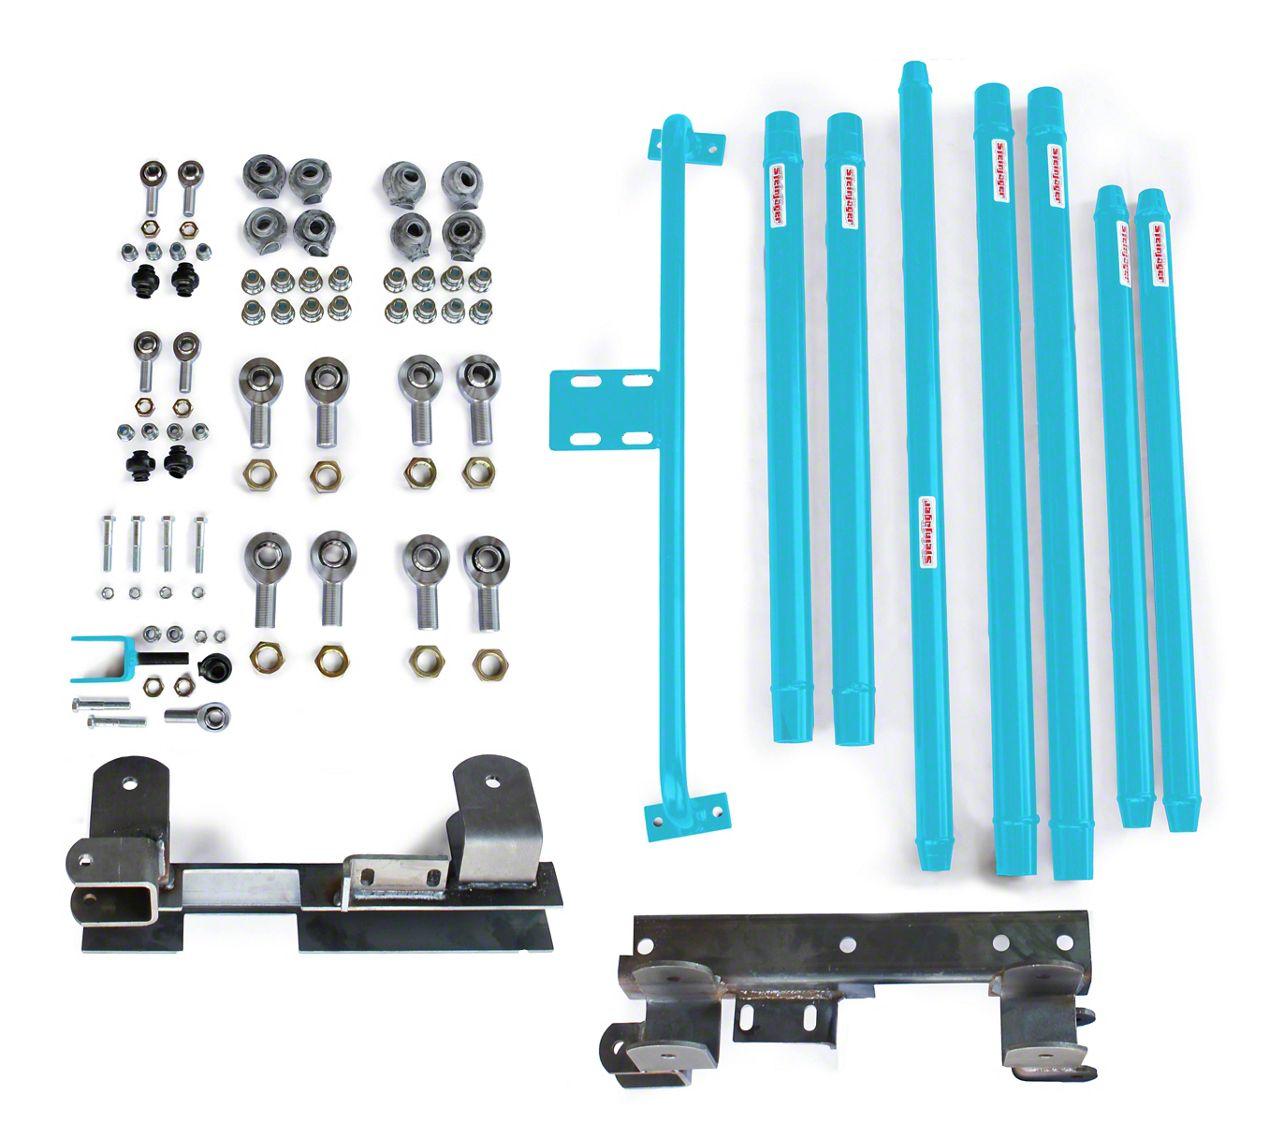 Steinjager Chrome Moly Tube Long Arm Tavel Kit for 2-6 in. Lift - Playboy Blue (97-06 Jeep Wrangler TJ)